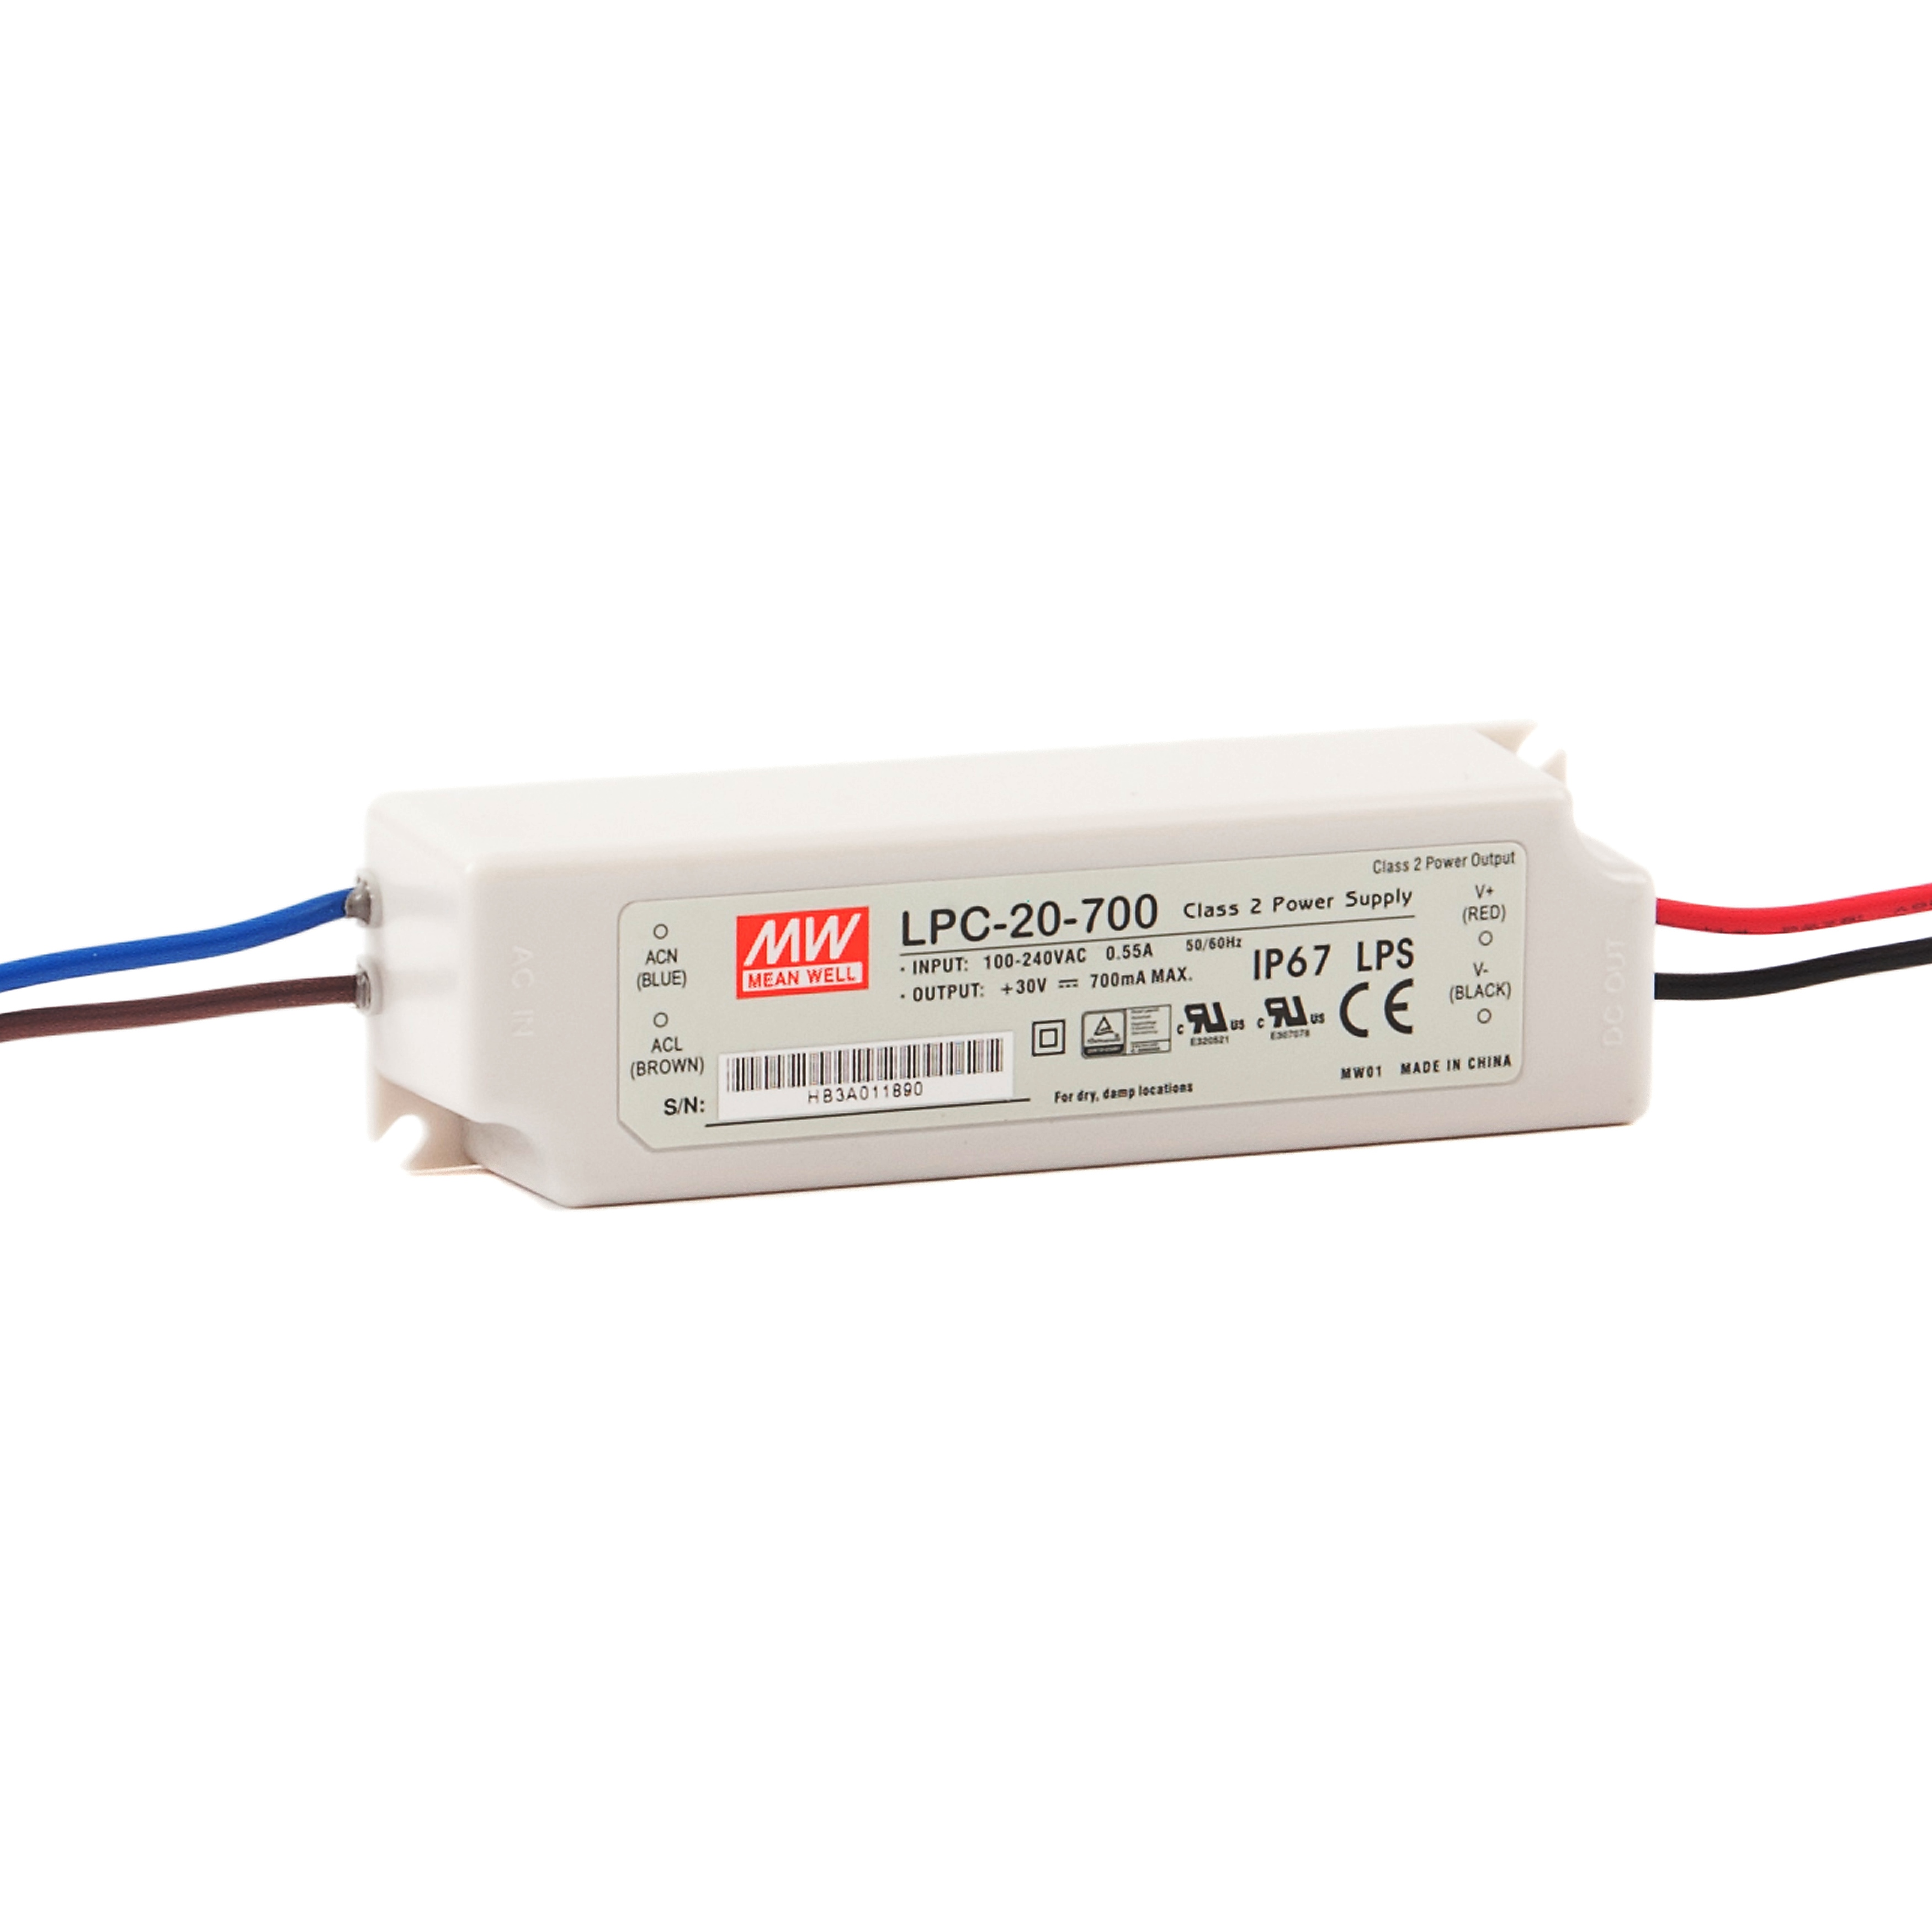 Lpc 20 Watt Led Power Supply To Ip67 700ma Circuit 700